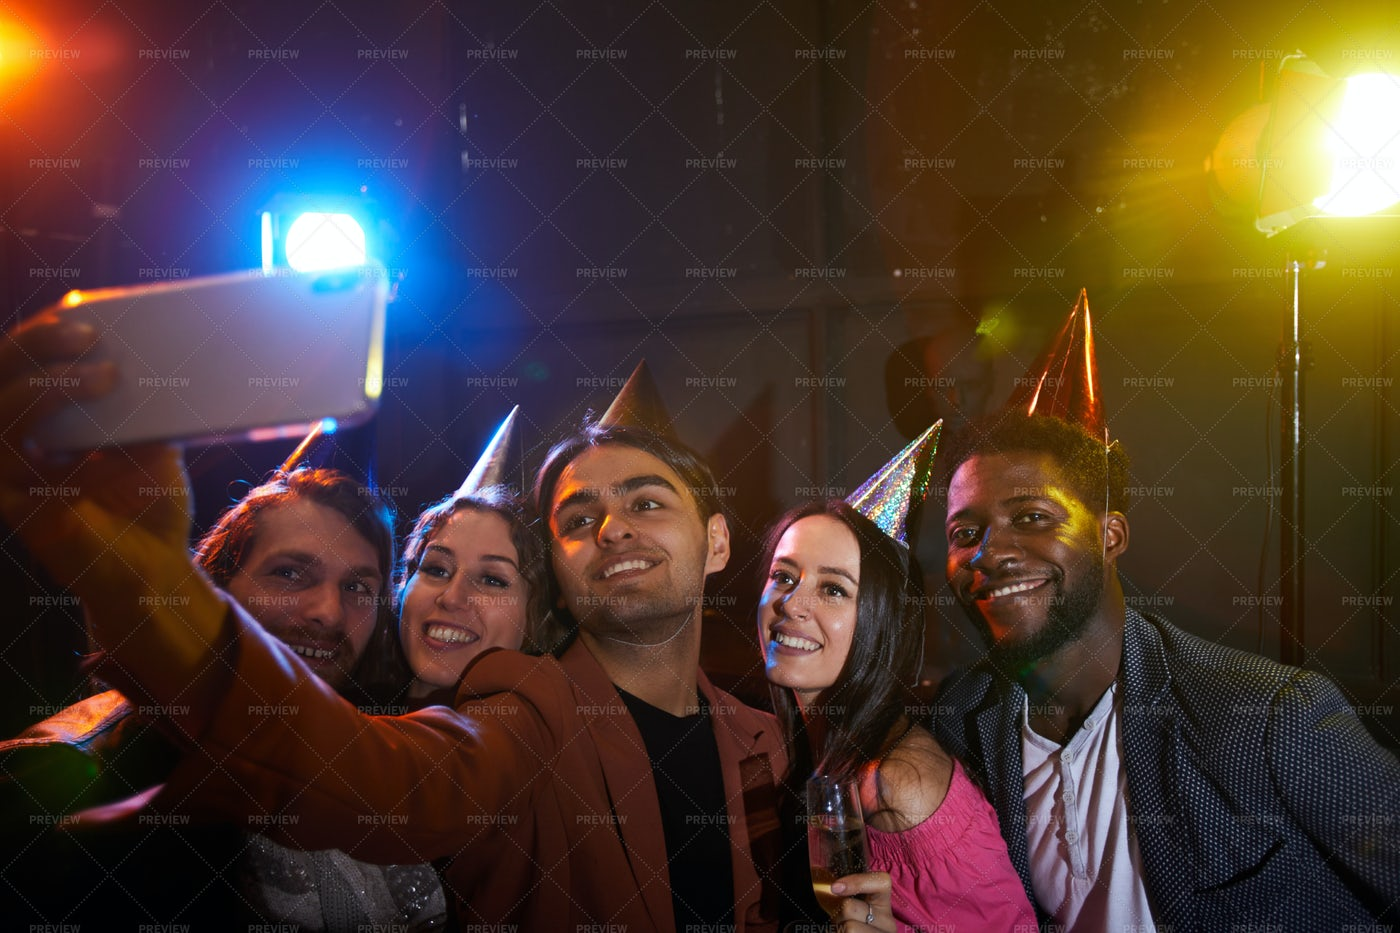 Birthday Party In Nightclub: Stock Photos